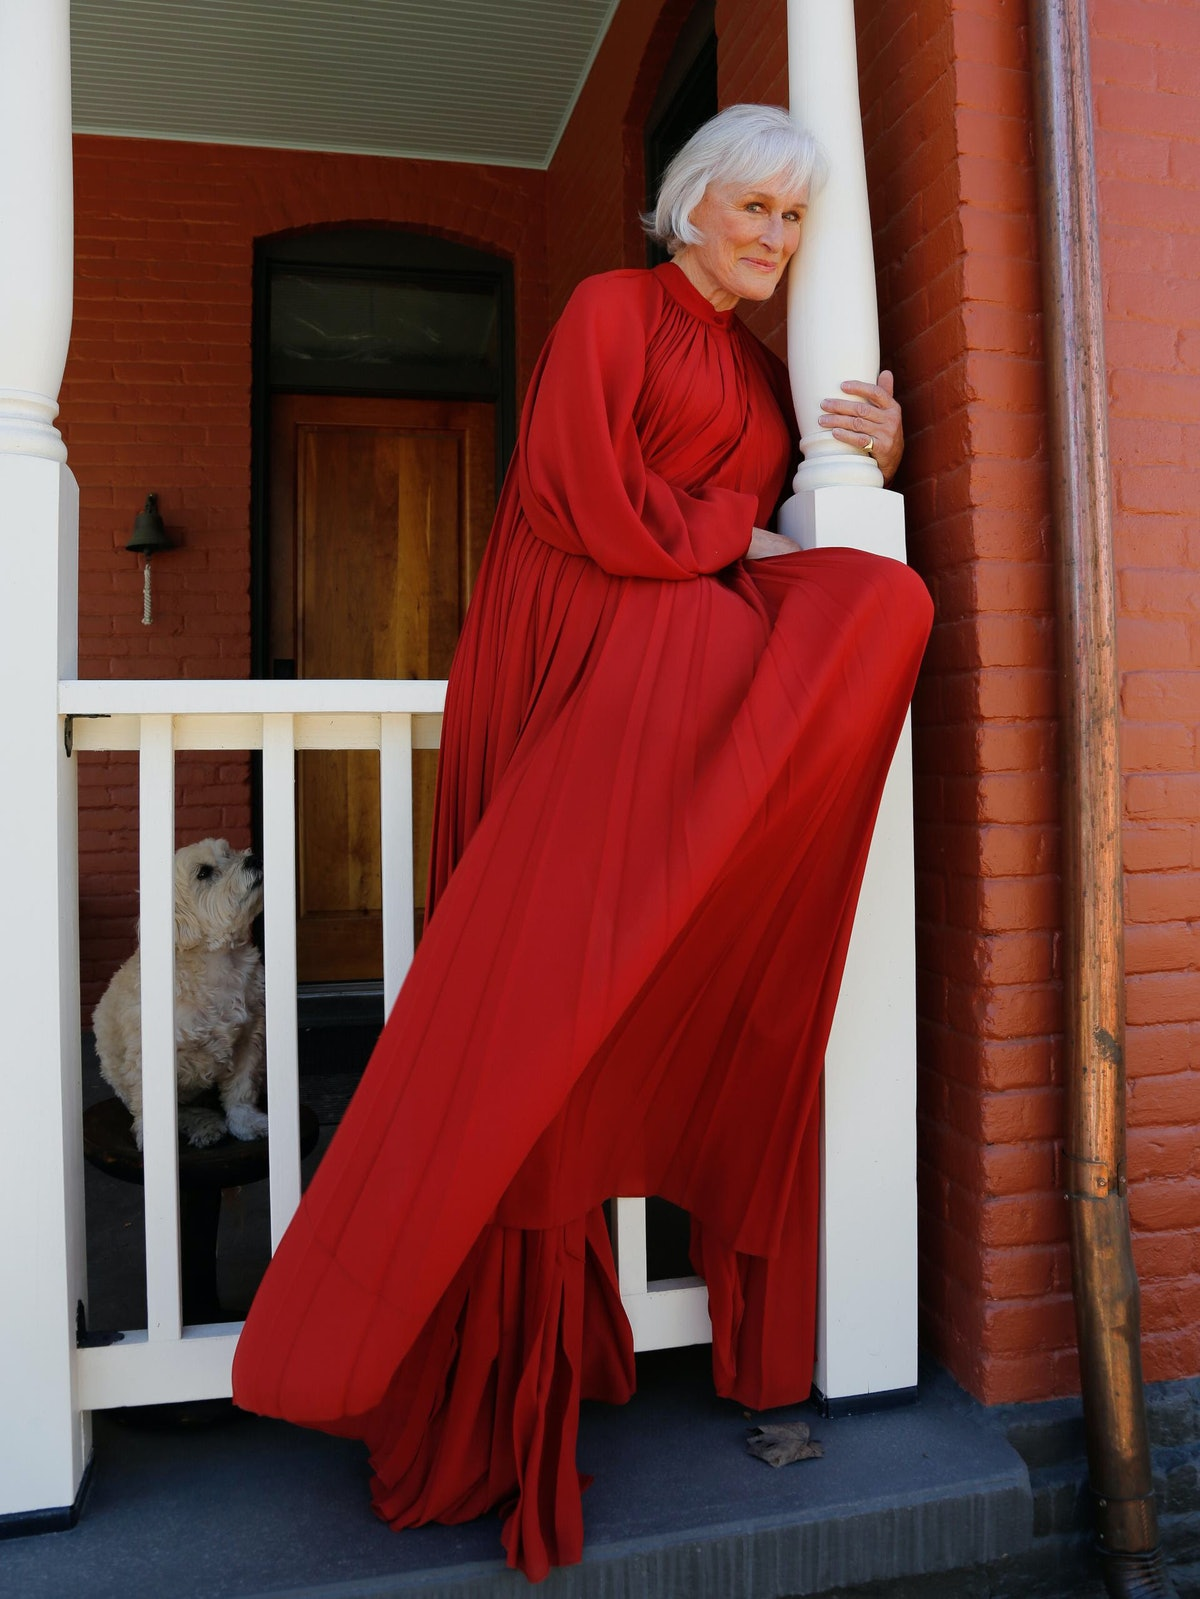 Glenn Close red dress